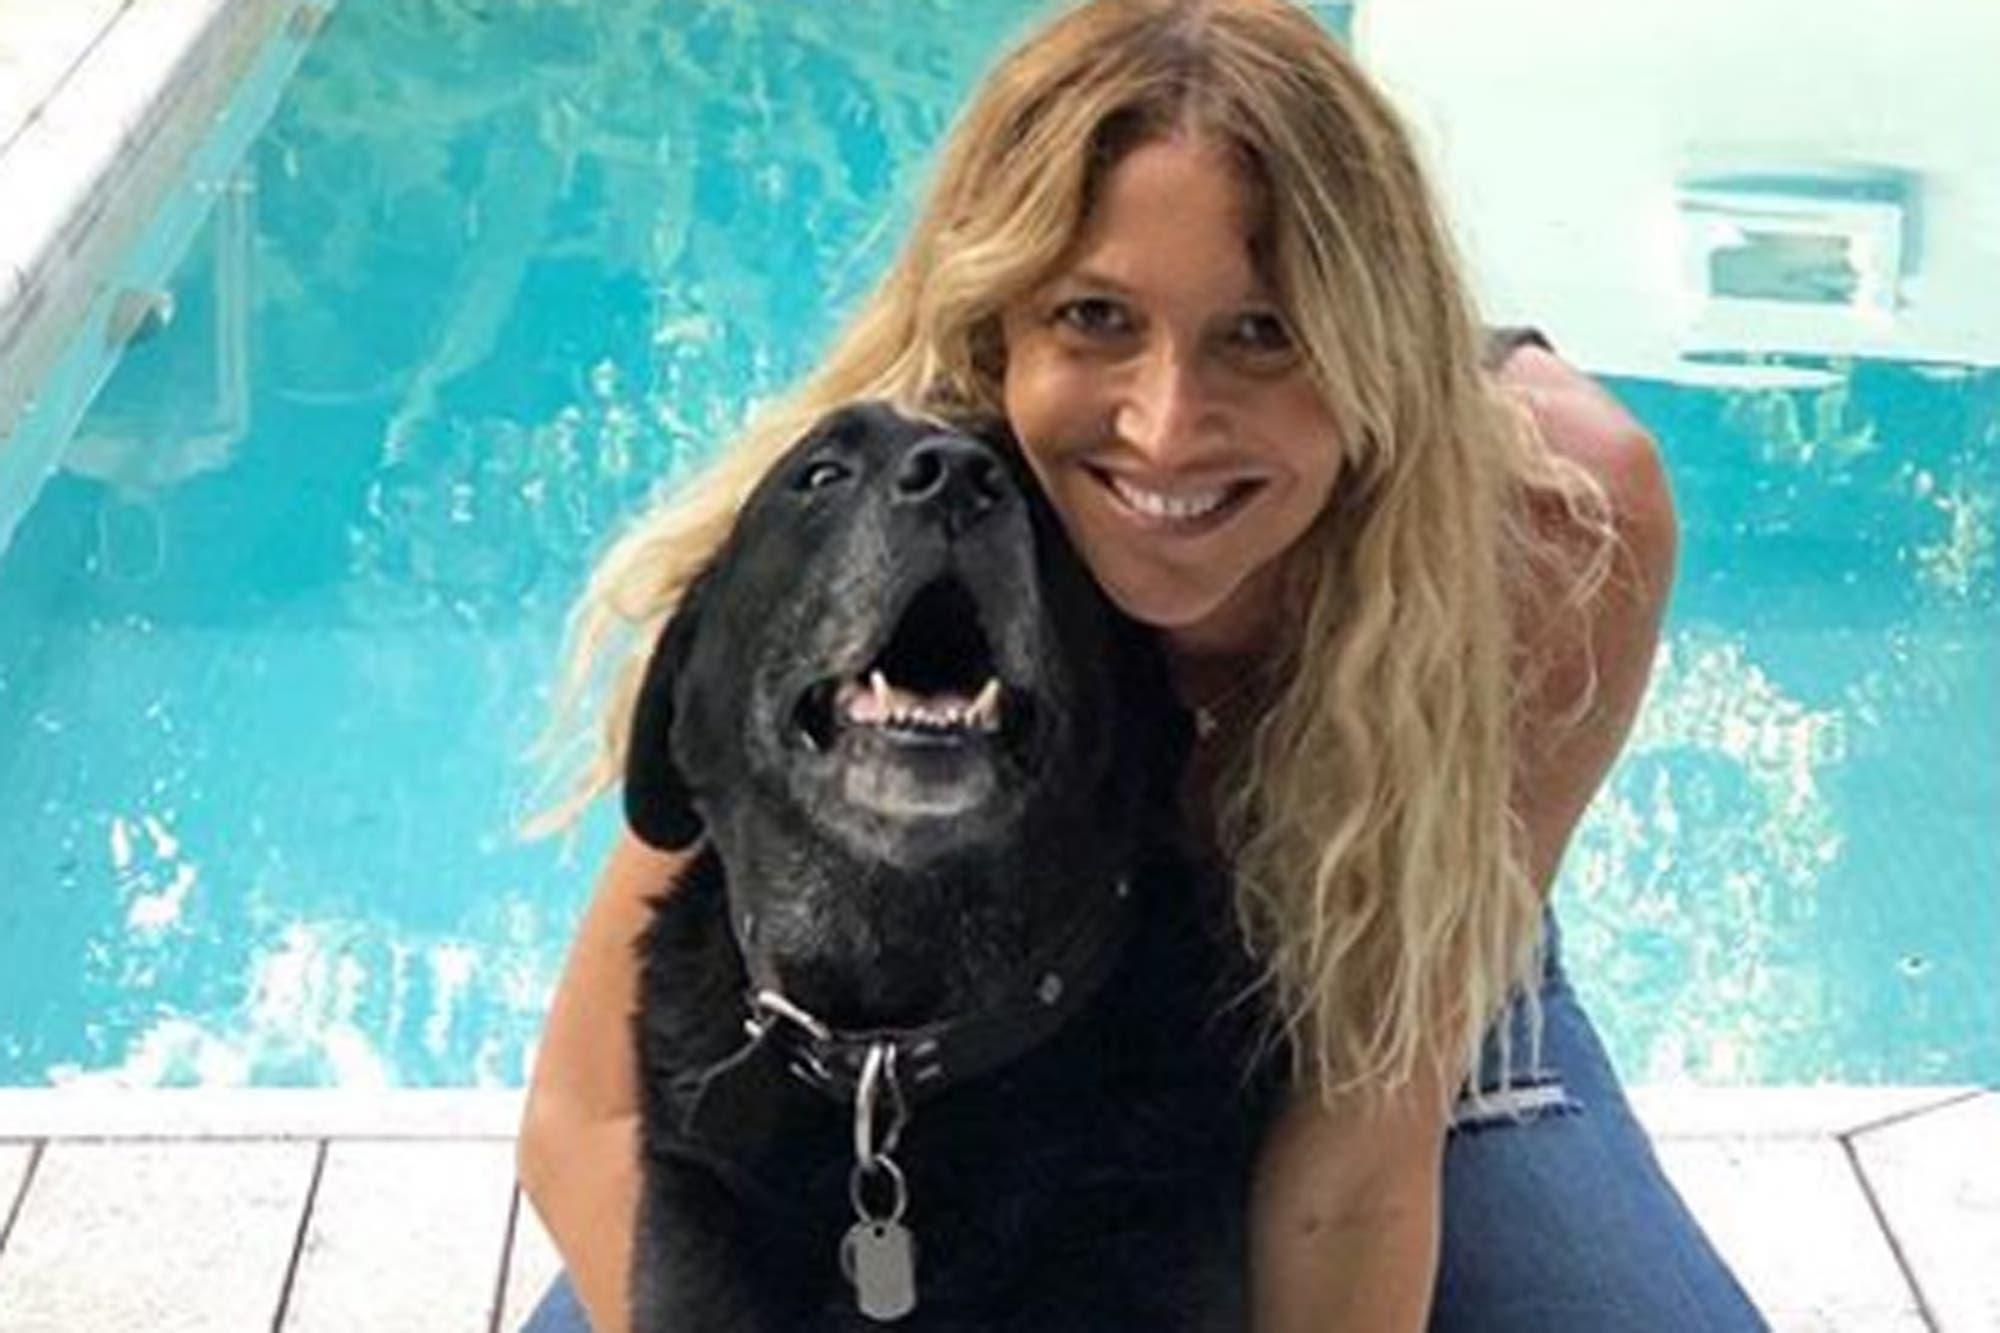 La muerte de Maca Azumendi: la emotiva despedida de Verónica Lozano